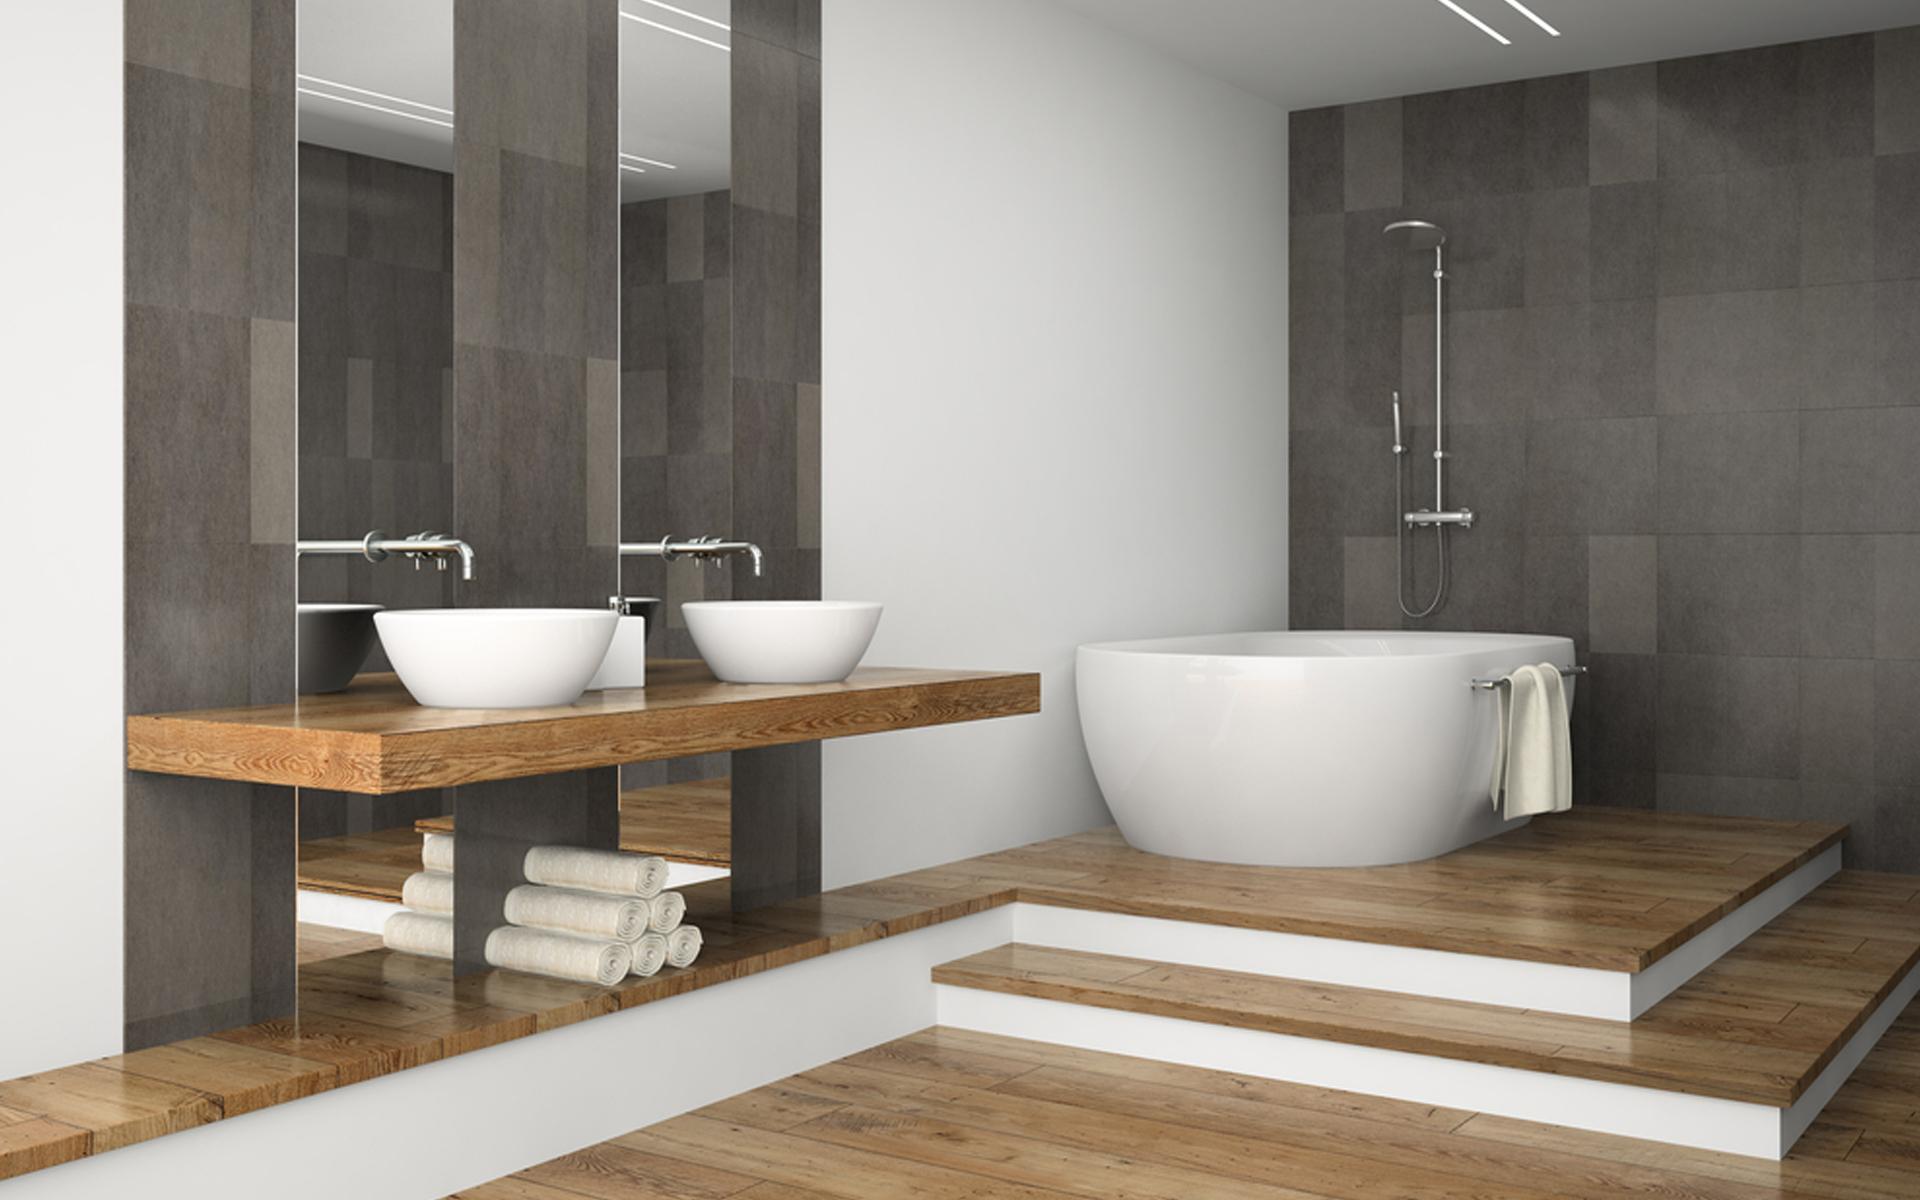 Badkamer verbouwen in eindhoven aannemer eindhoven - Badkamer wc ...